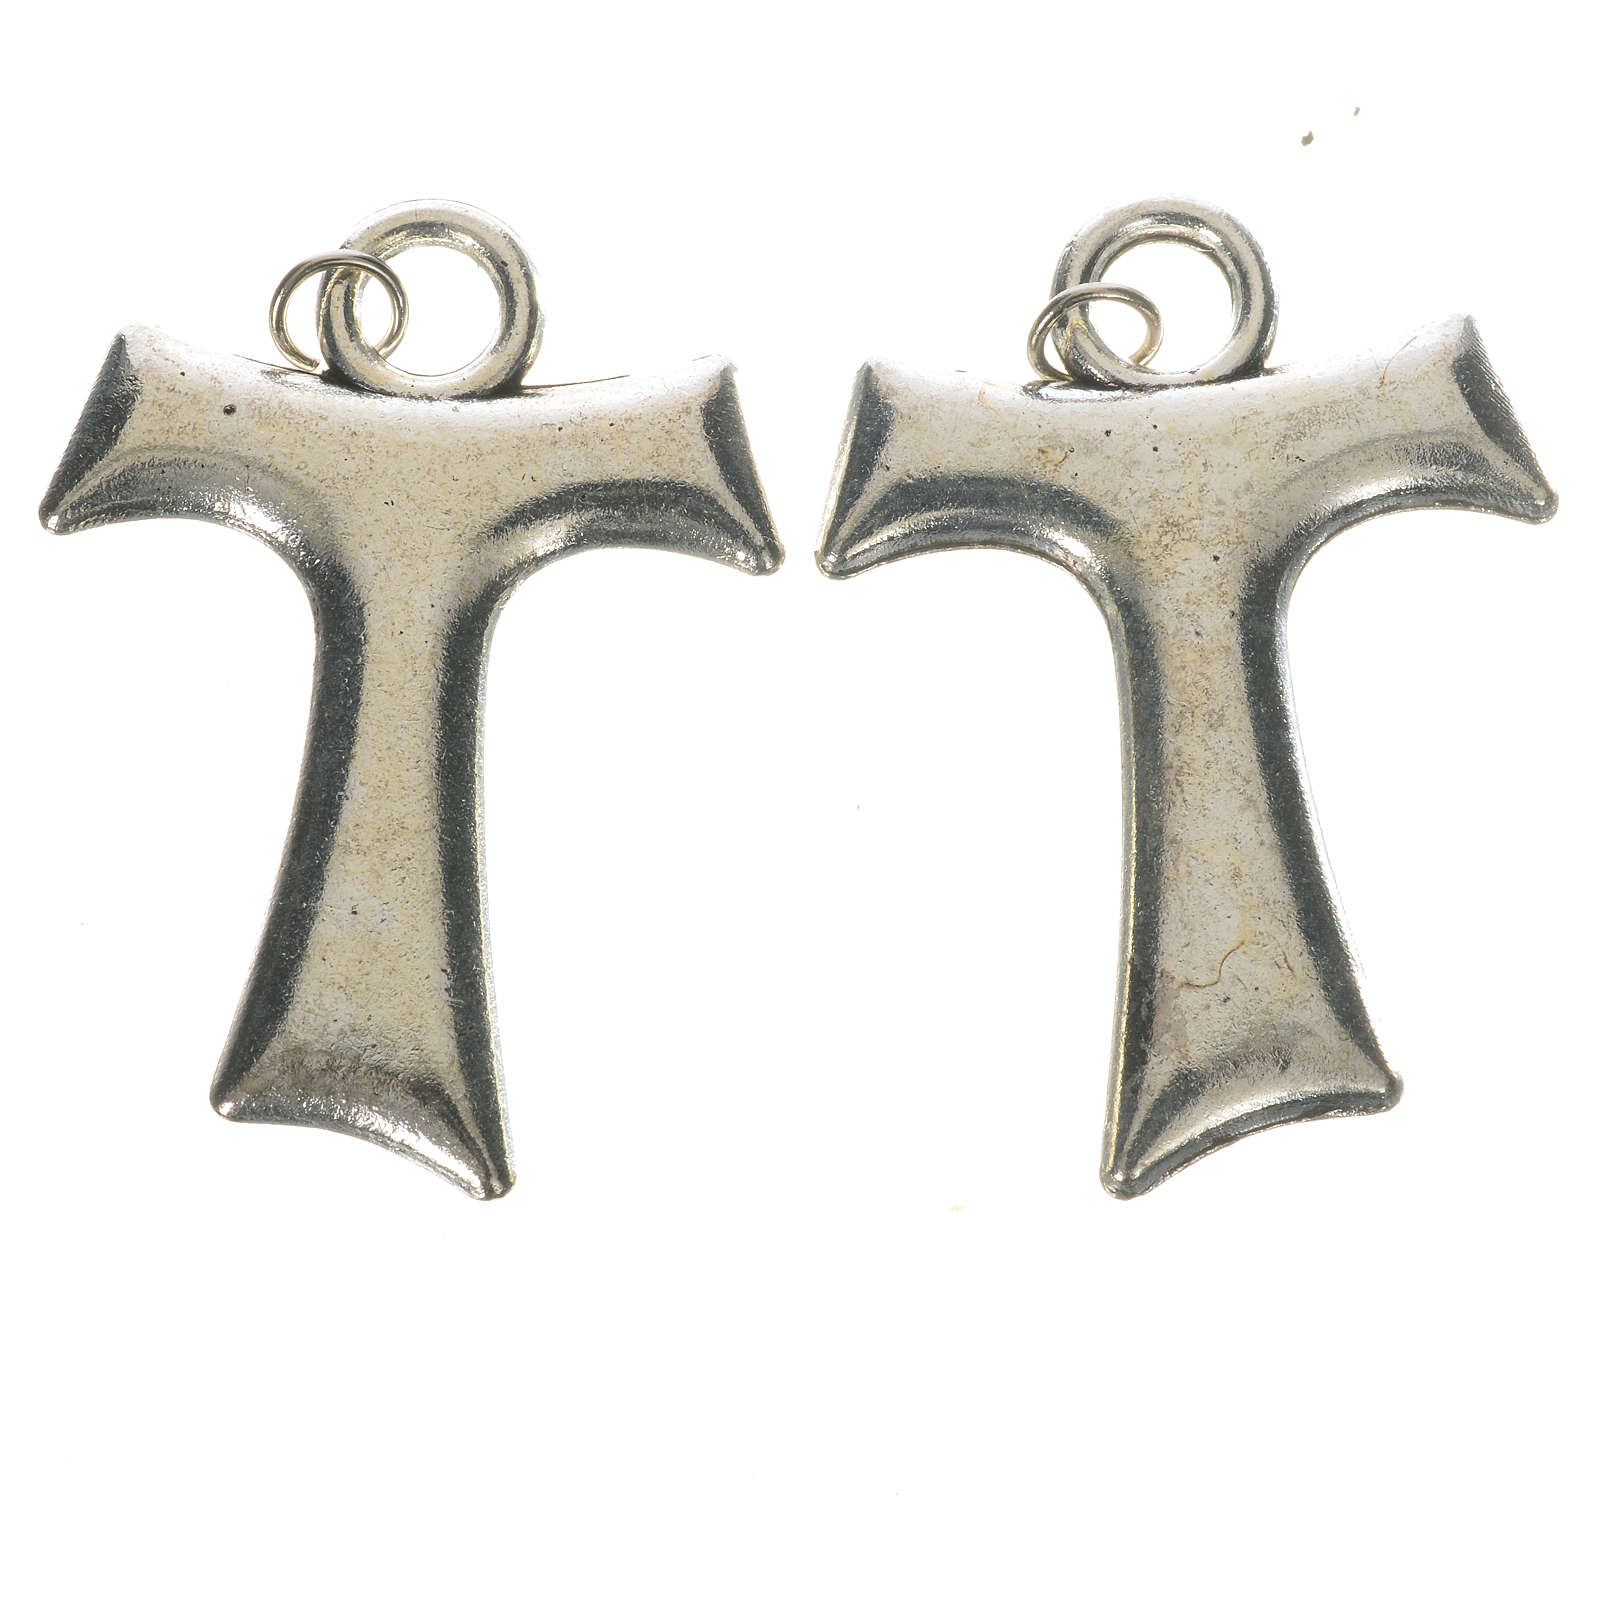 Croix Tau avec anneau 4